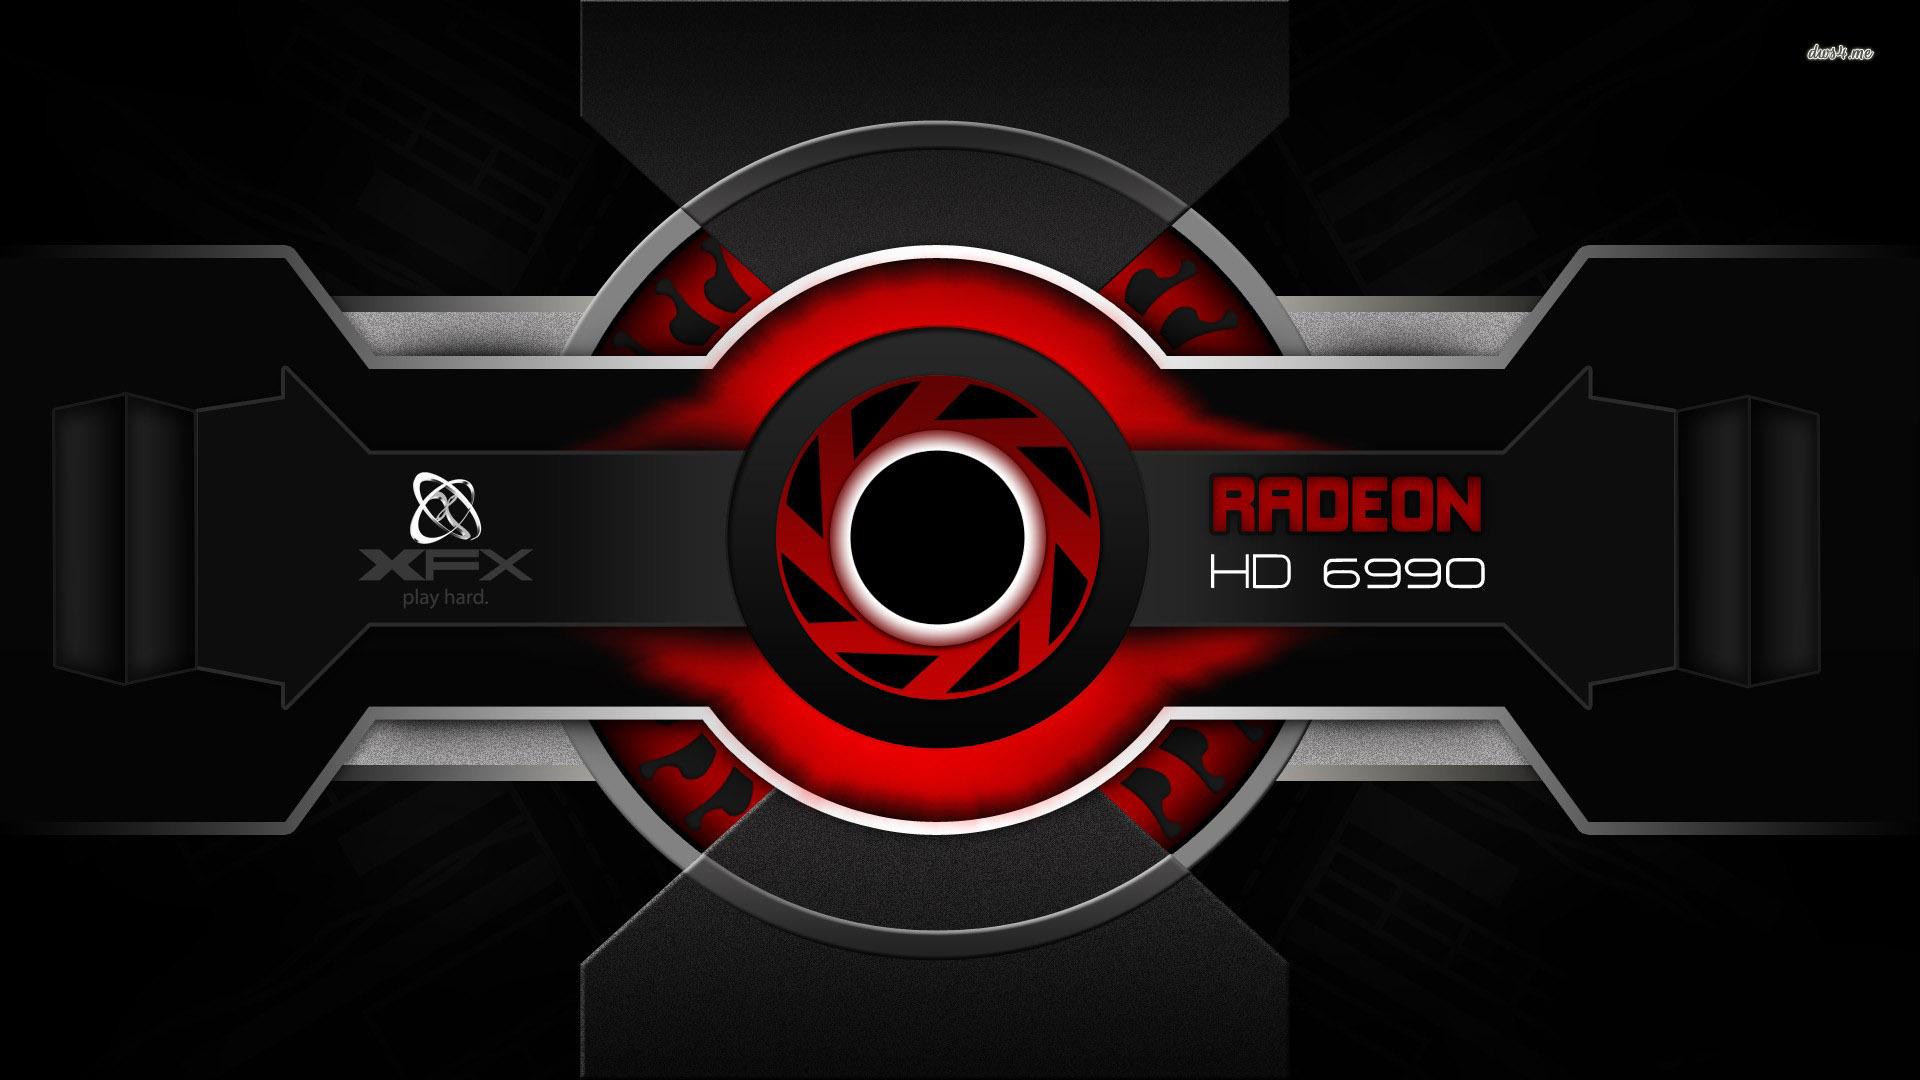 AMD Radeon wallpaper 1280x800 AMD Radeon wallpaper 1366x768 AMD Radeon 1920x1080